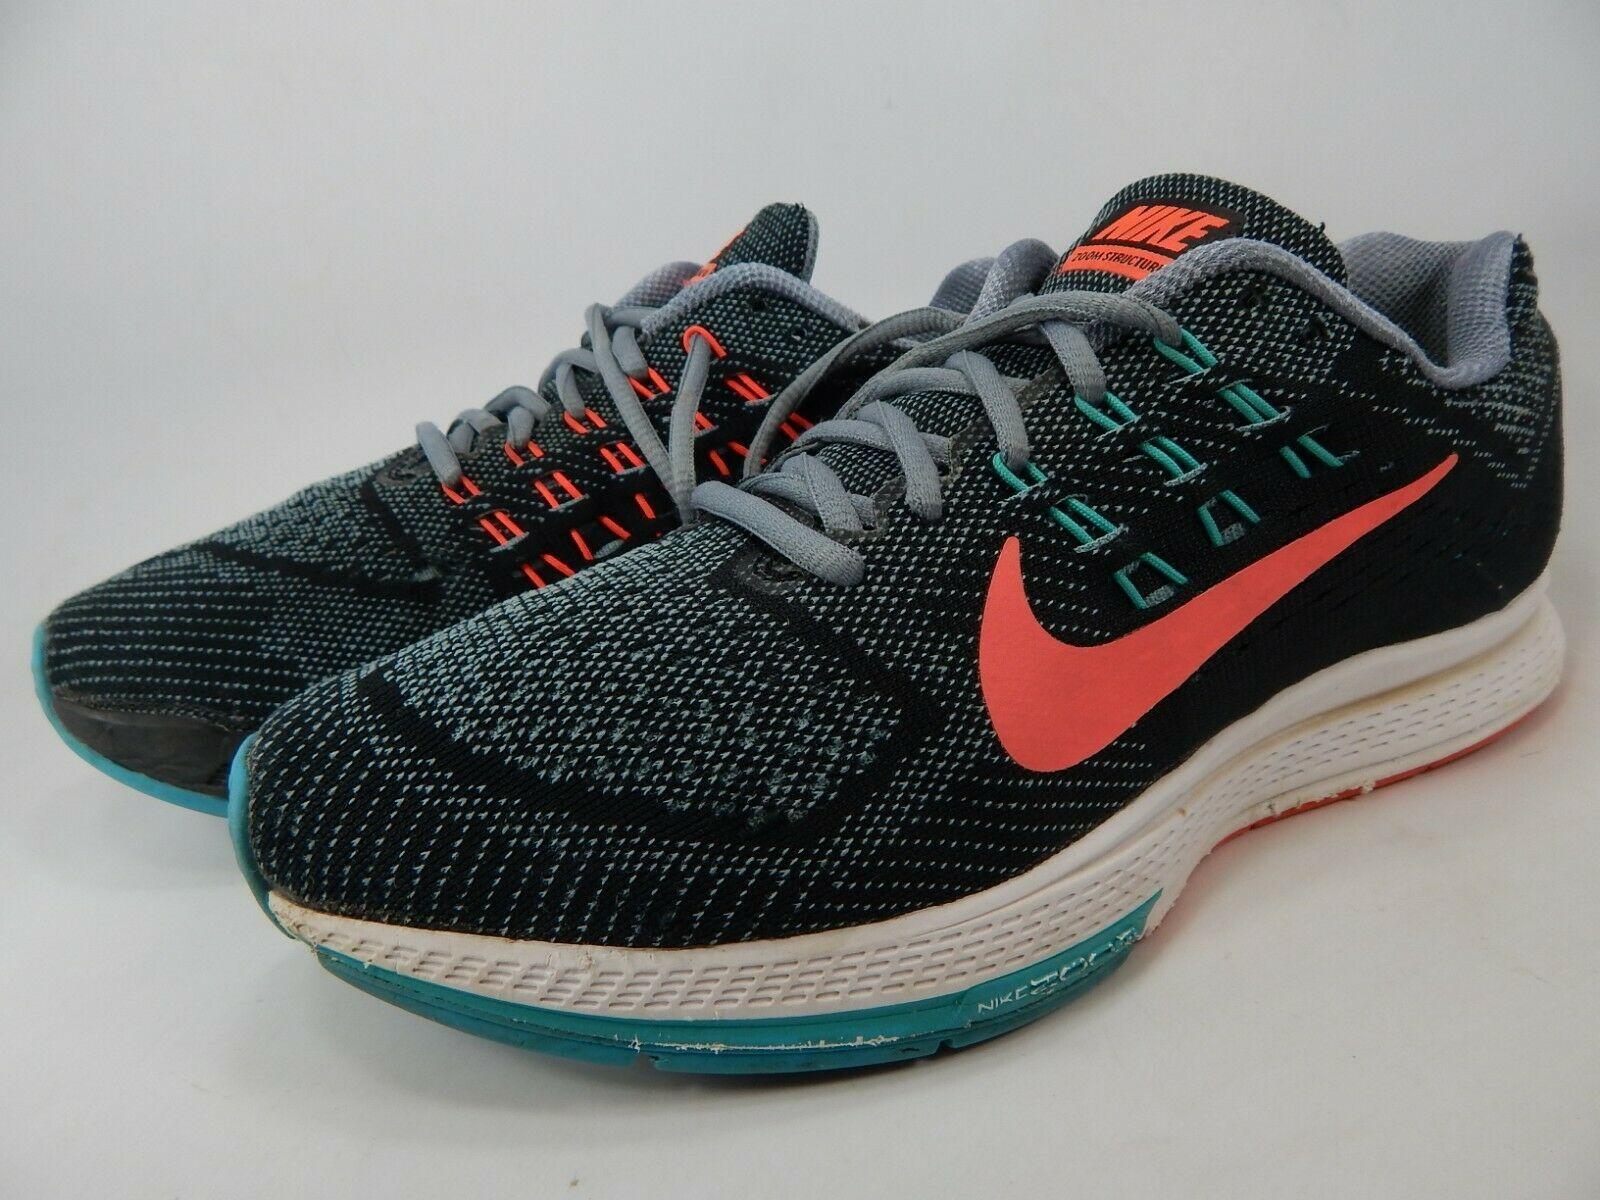 28656eedc0c9 Nike Air Zoom Structure 18 Size 9 M (B) EU 40.5 Women s Running ...